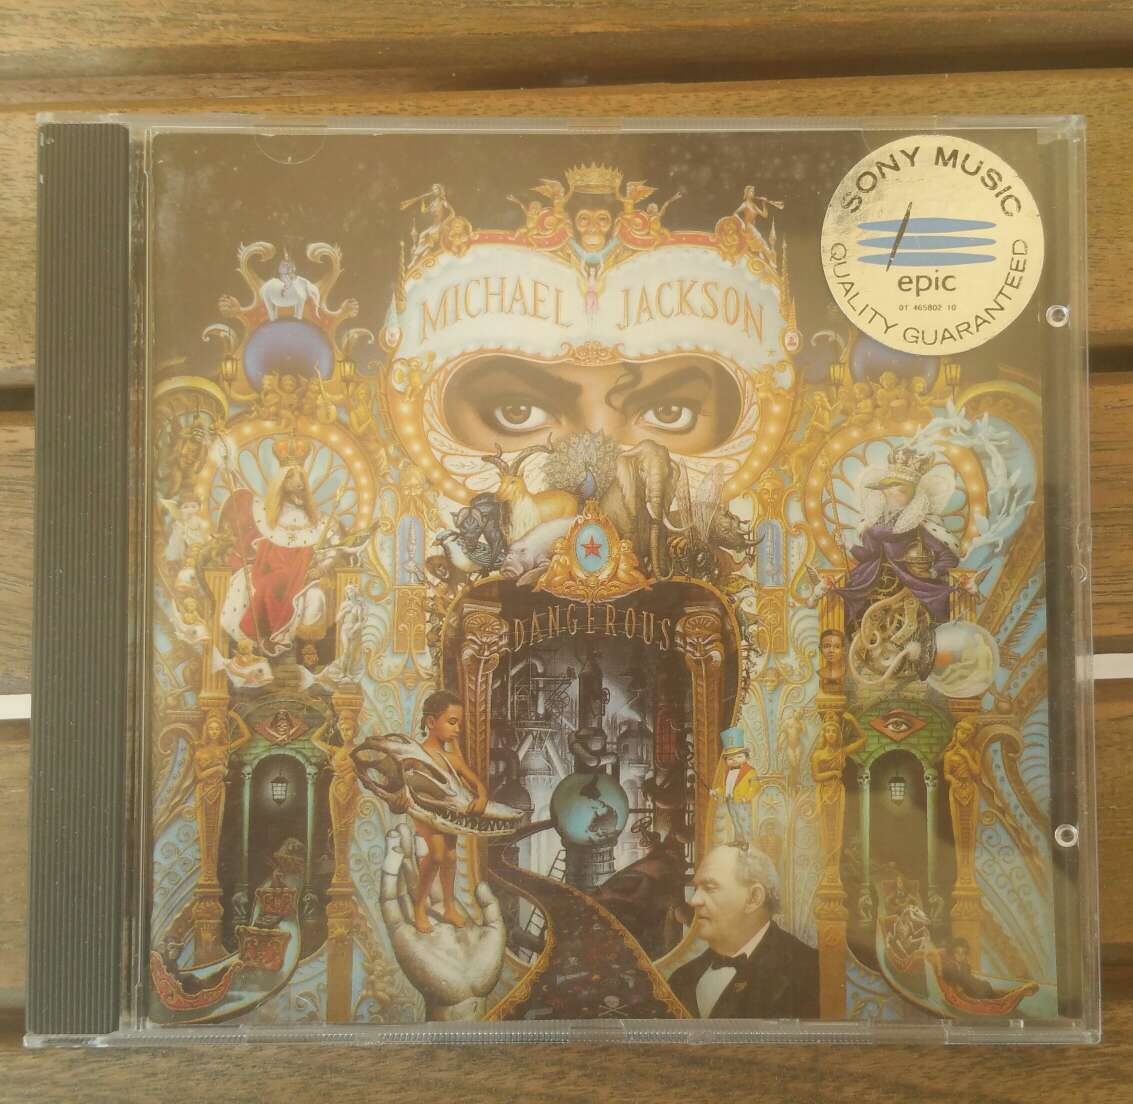 Imagen CD Música Michael Jackson